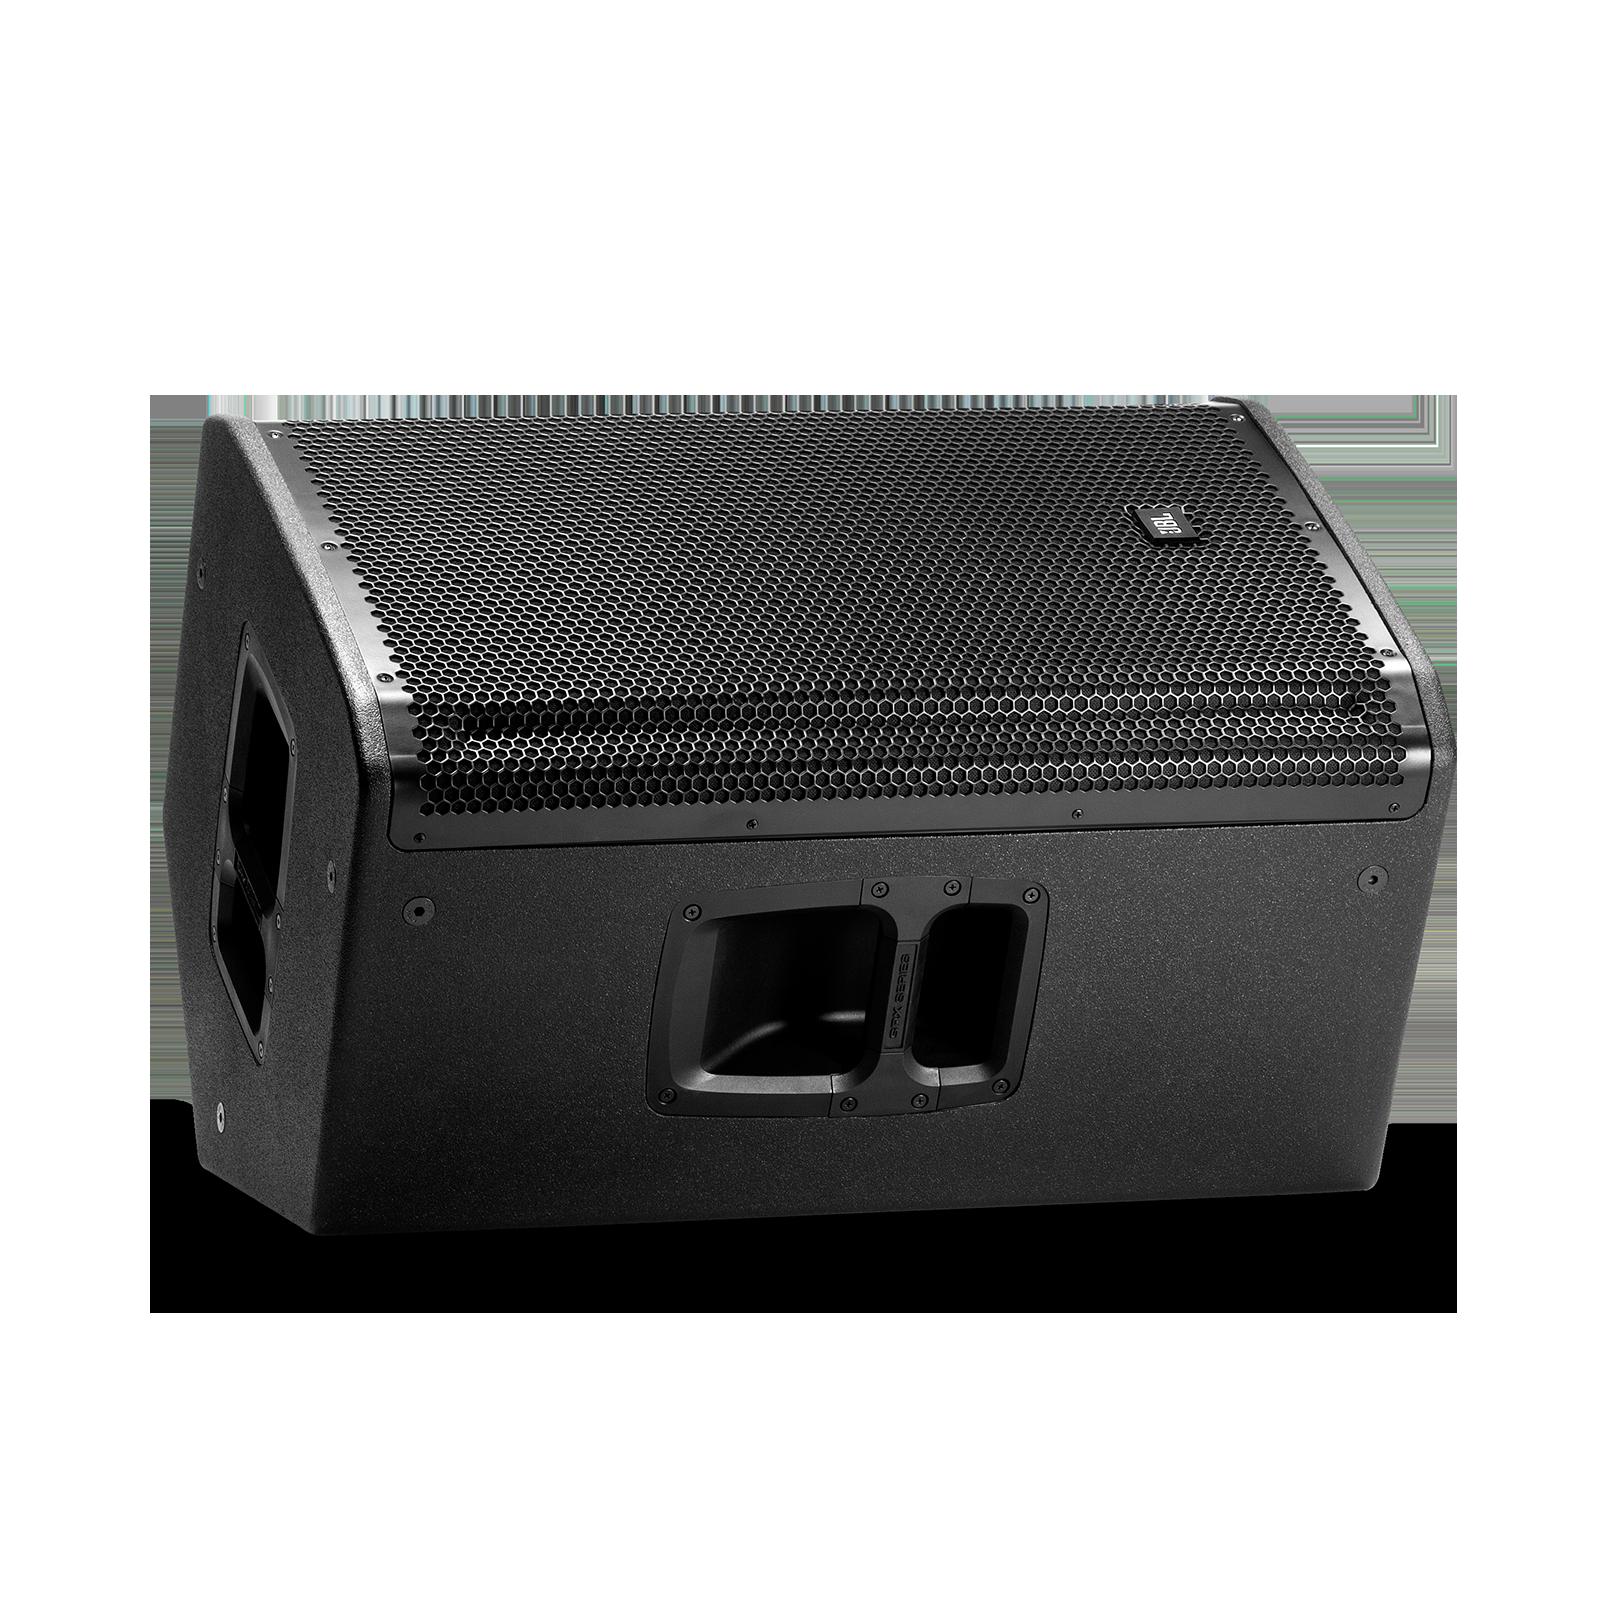 "JBL SRX815P - Black - 15"" Two-Way Bass Reflex Self-Powered System - Detailshot 4"